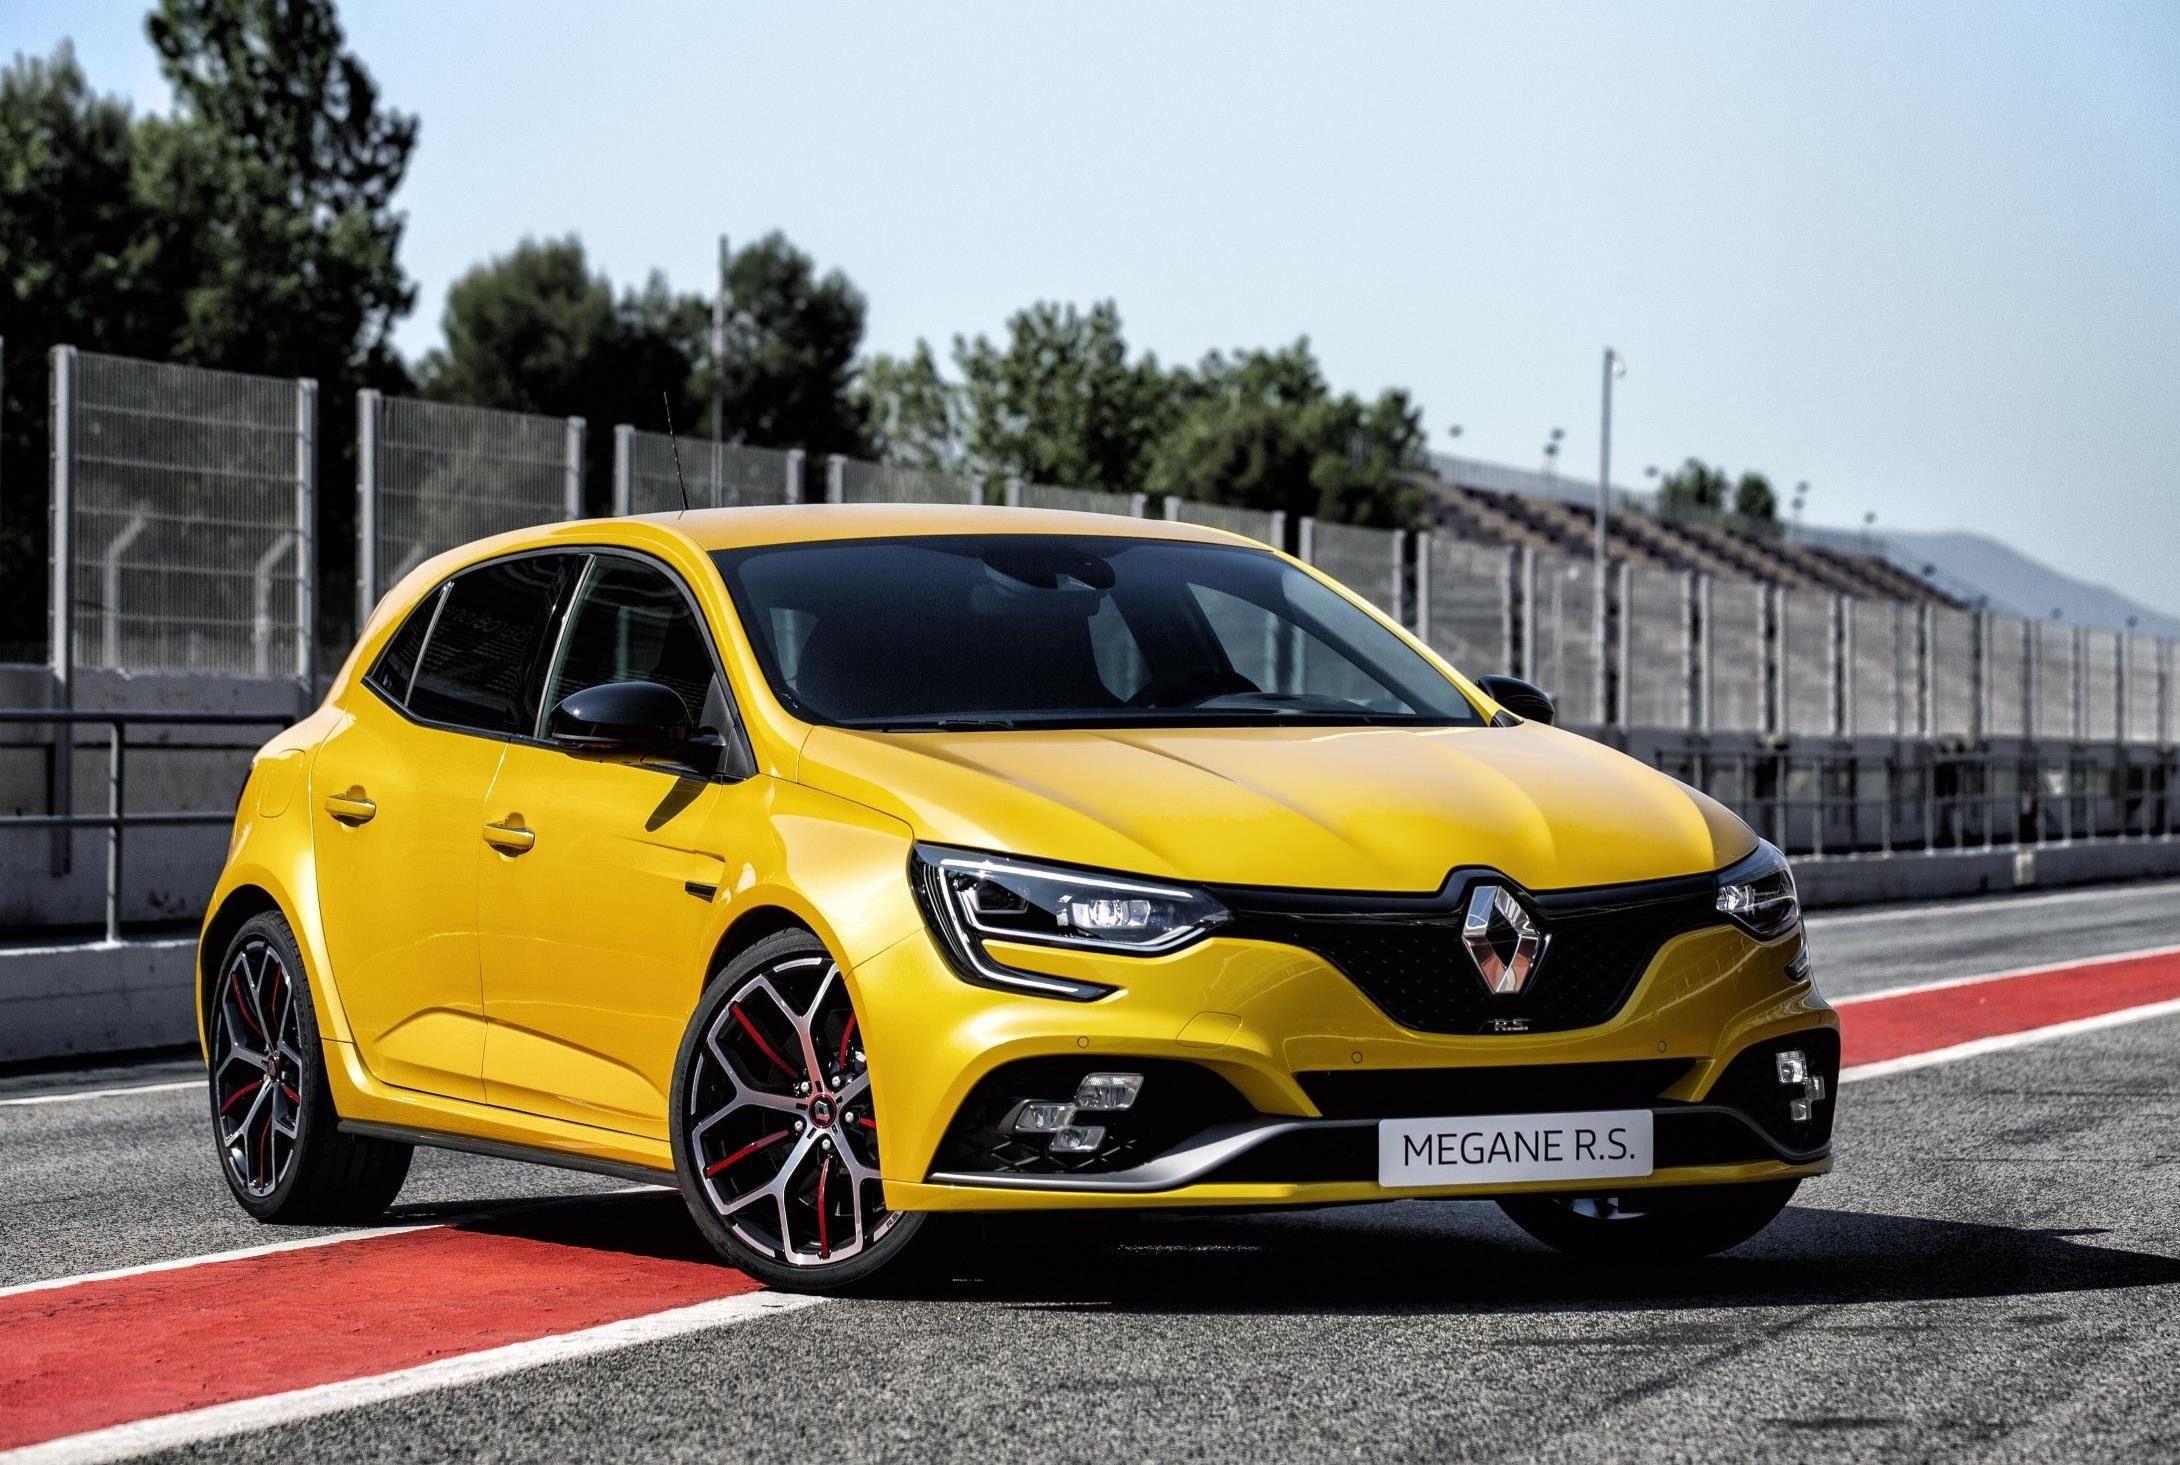 2019 Renault Megane Concept Renault Megane New Renault Renault